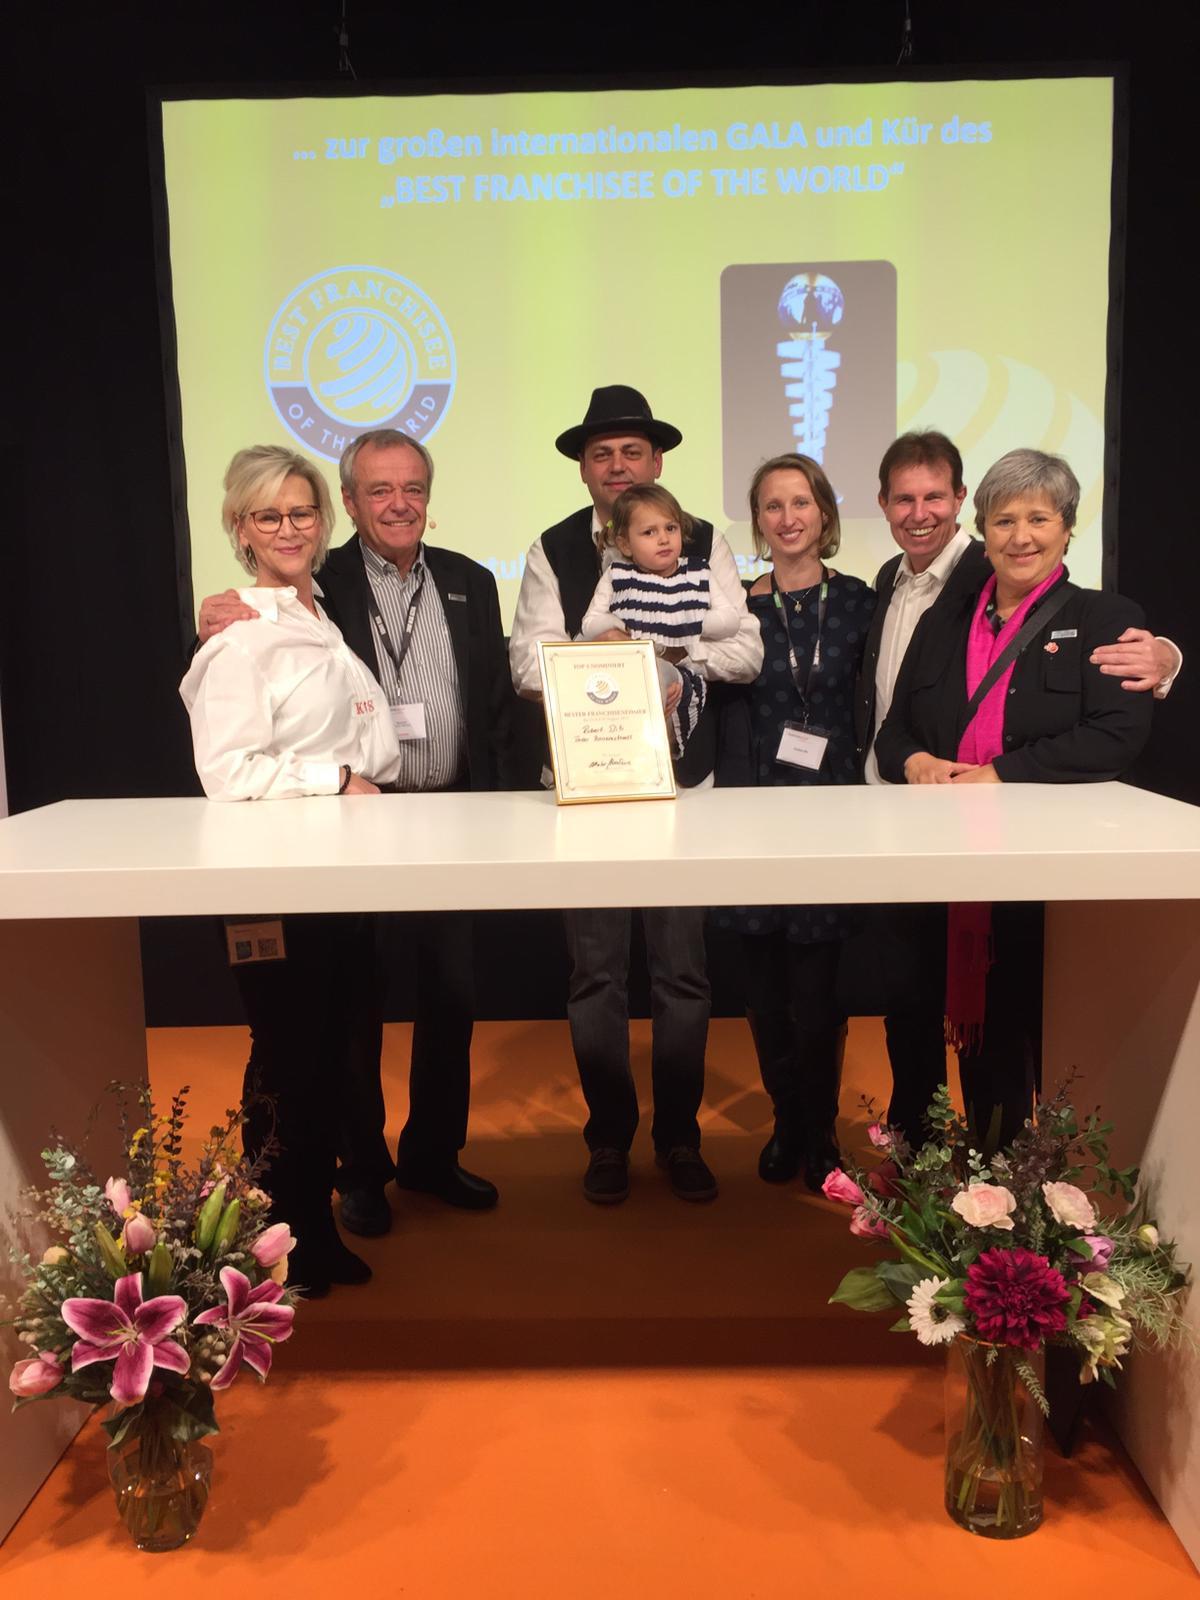 Tiroler Bauernstandl-Franchisepartner unter den TOP 5 der D-A-CH-Region